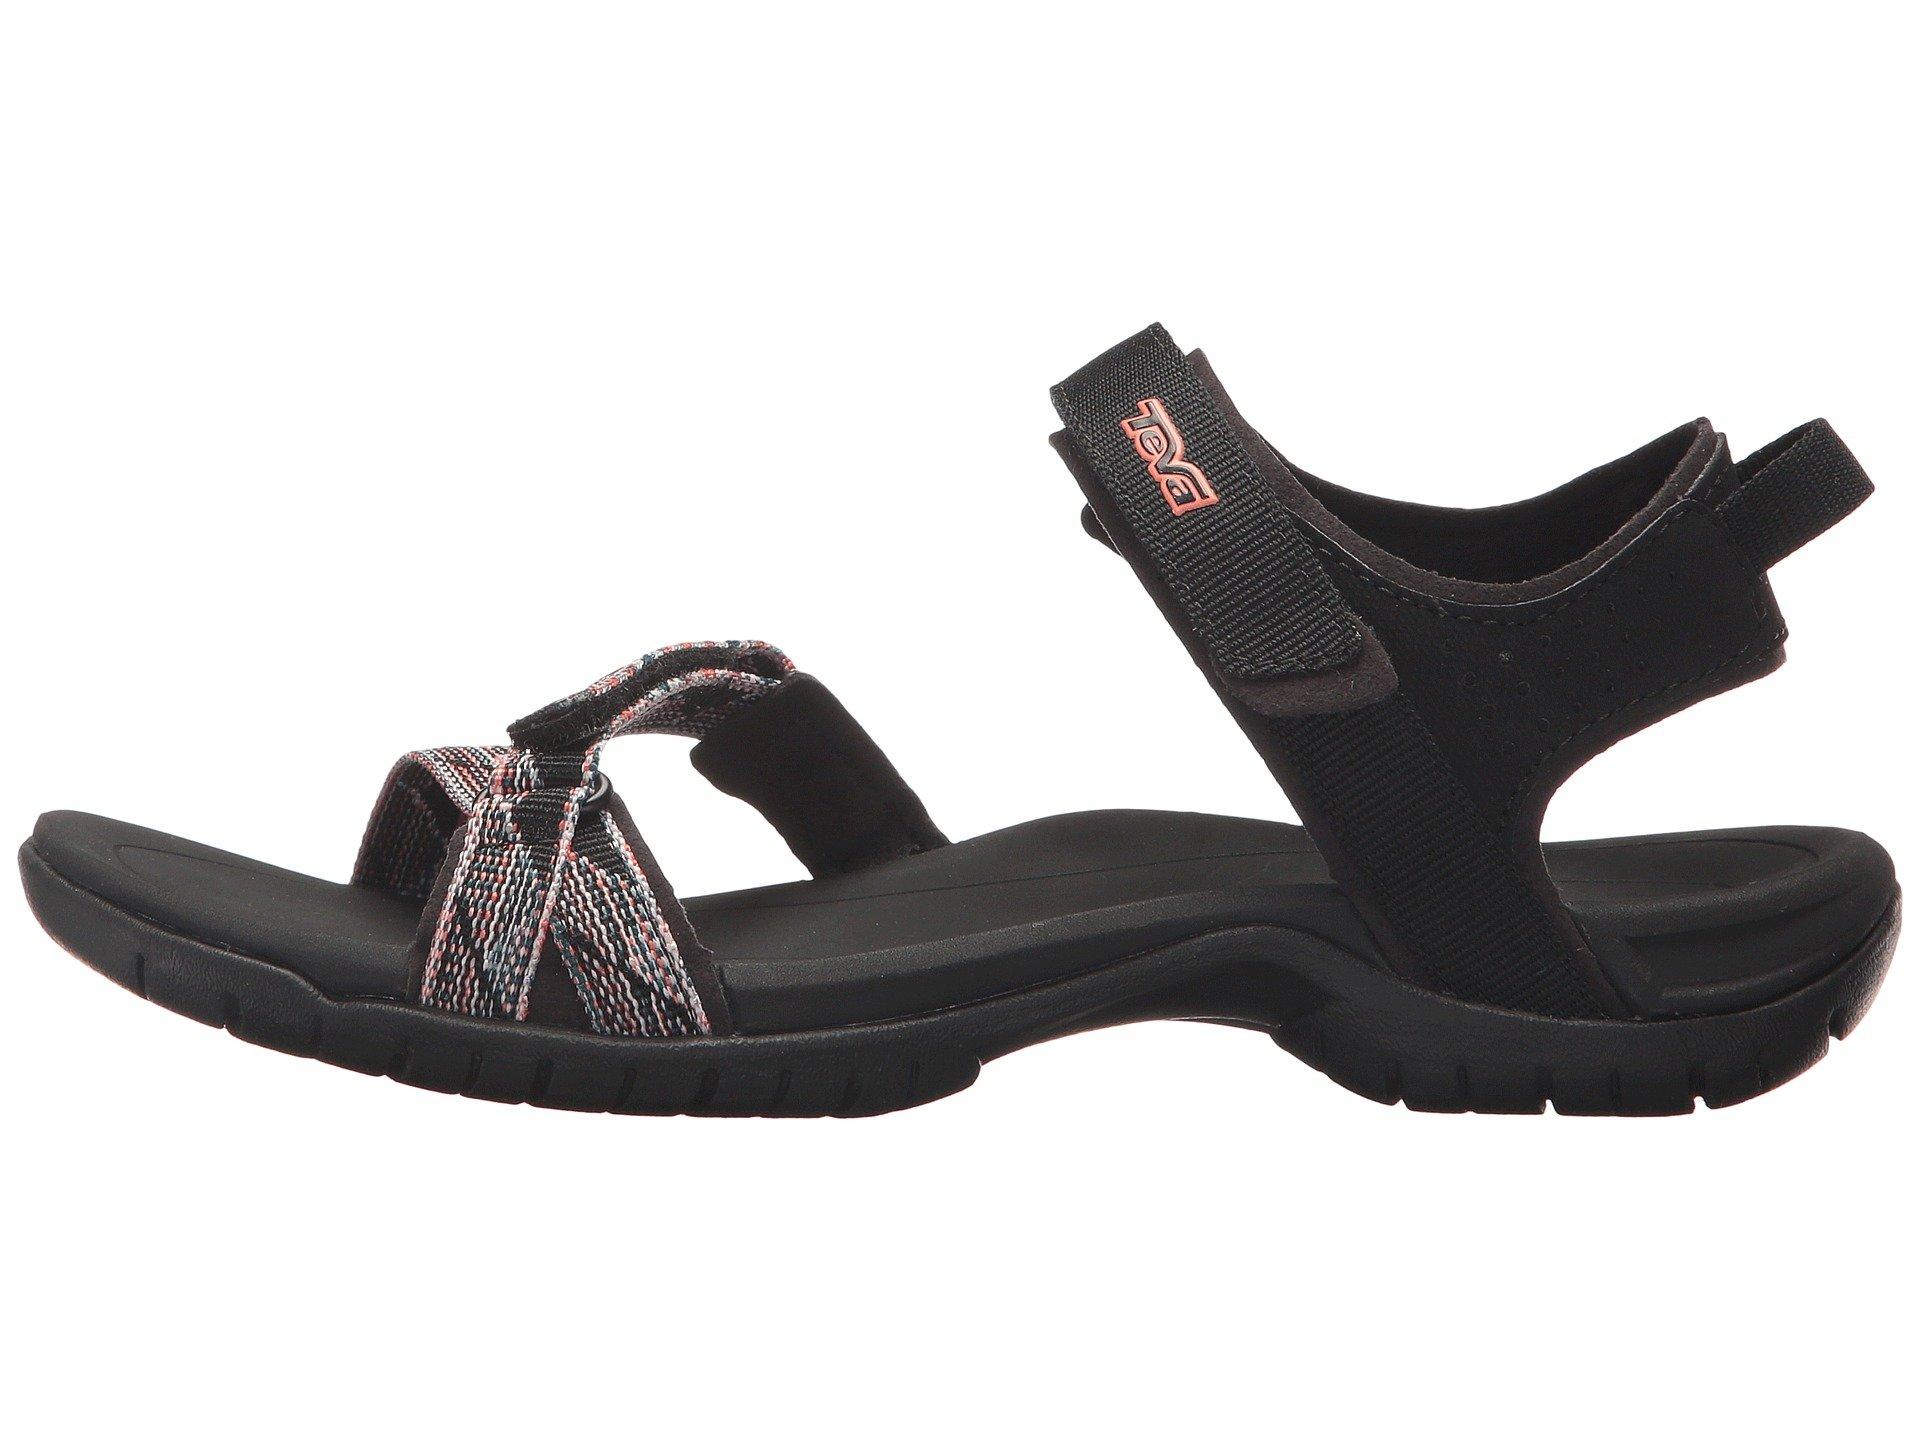 5643cd9c6604 Teva 1006263 Sbmlt Verra Suri Black Multi Women s Sandals 11 US. About this  product. Picture 1 of 7  Picture 2 of 7 ...